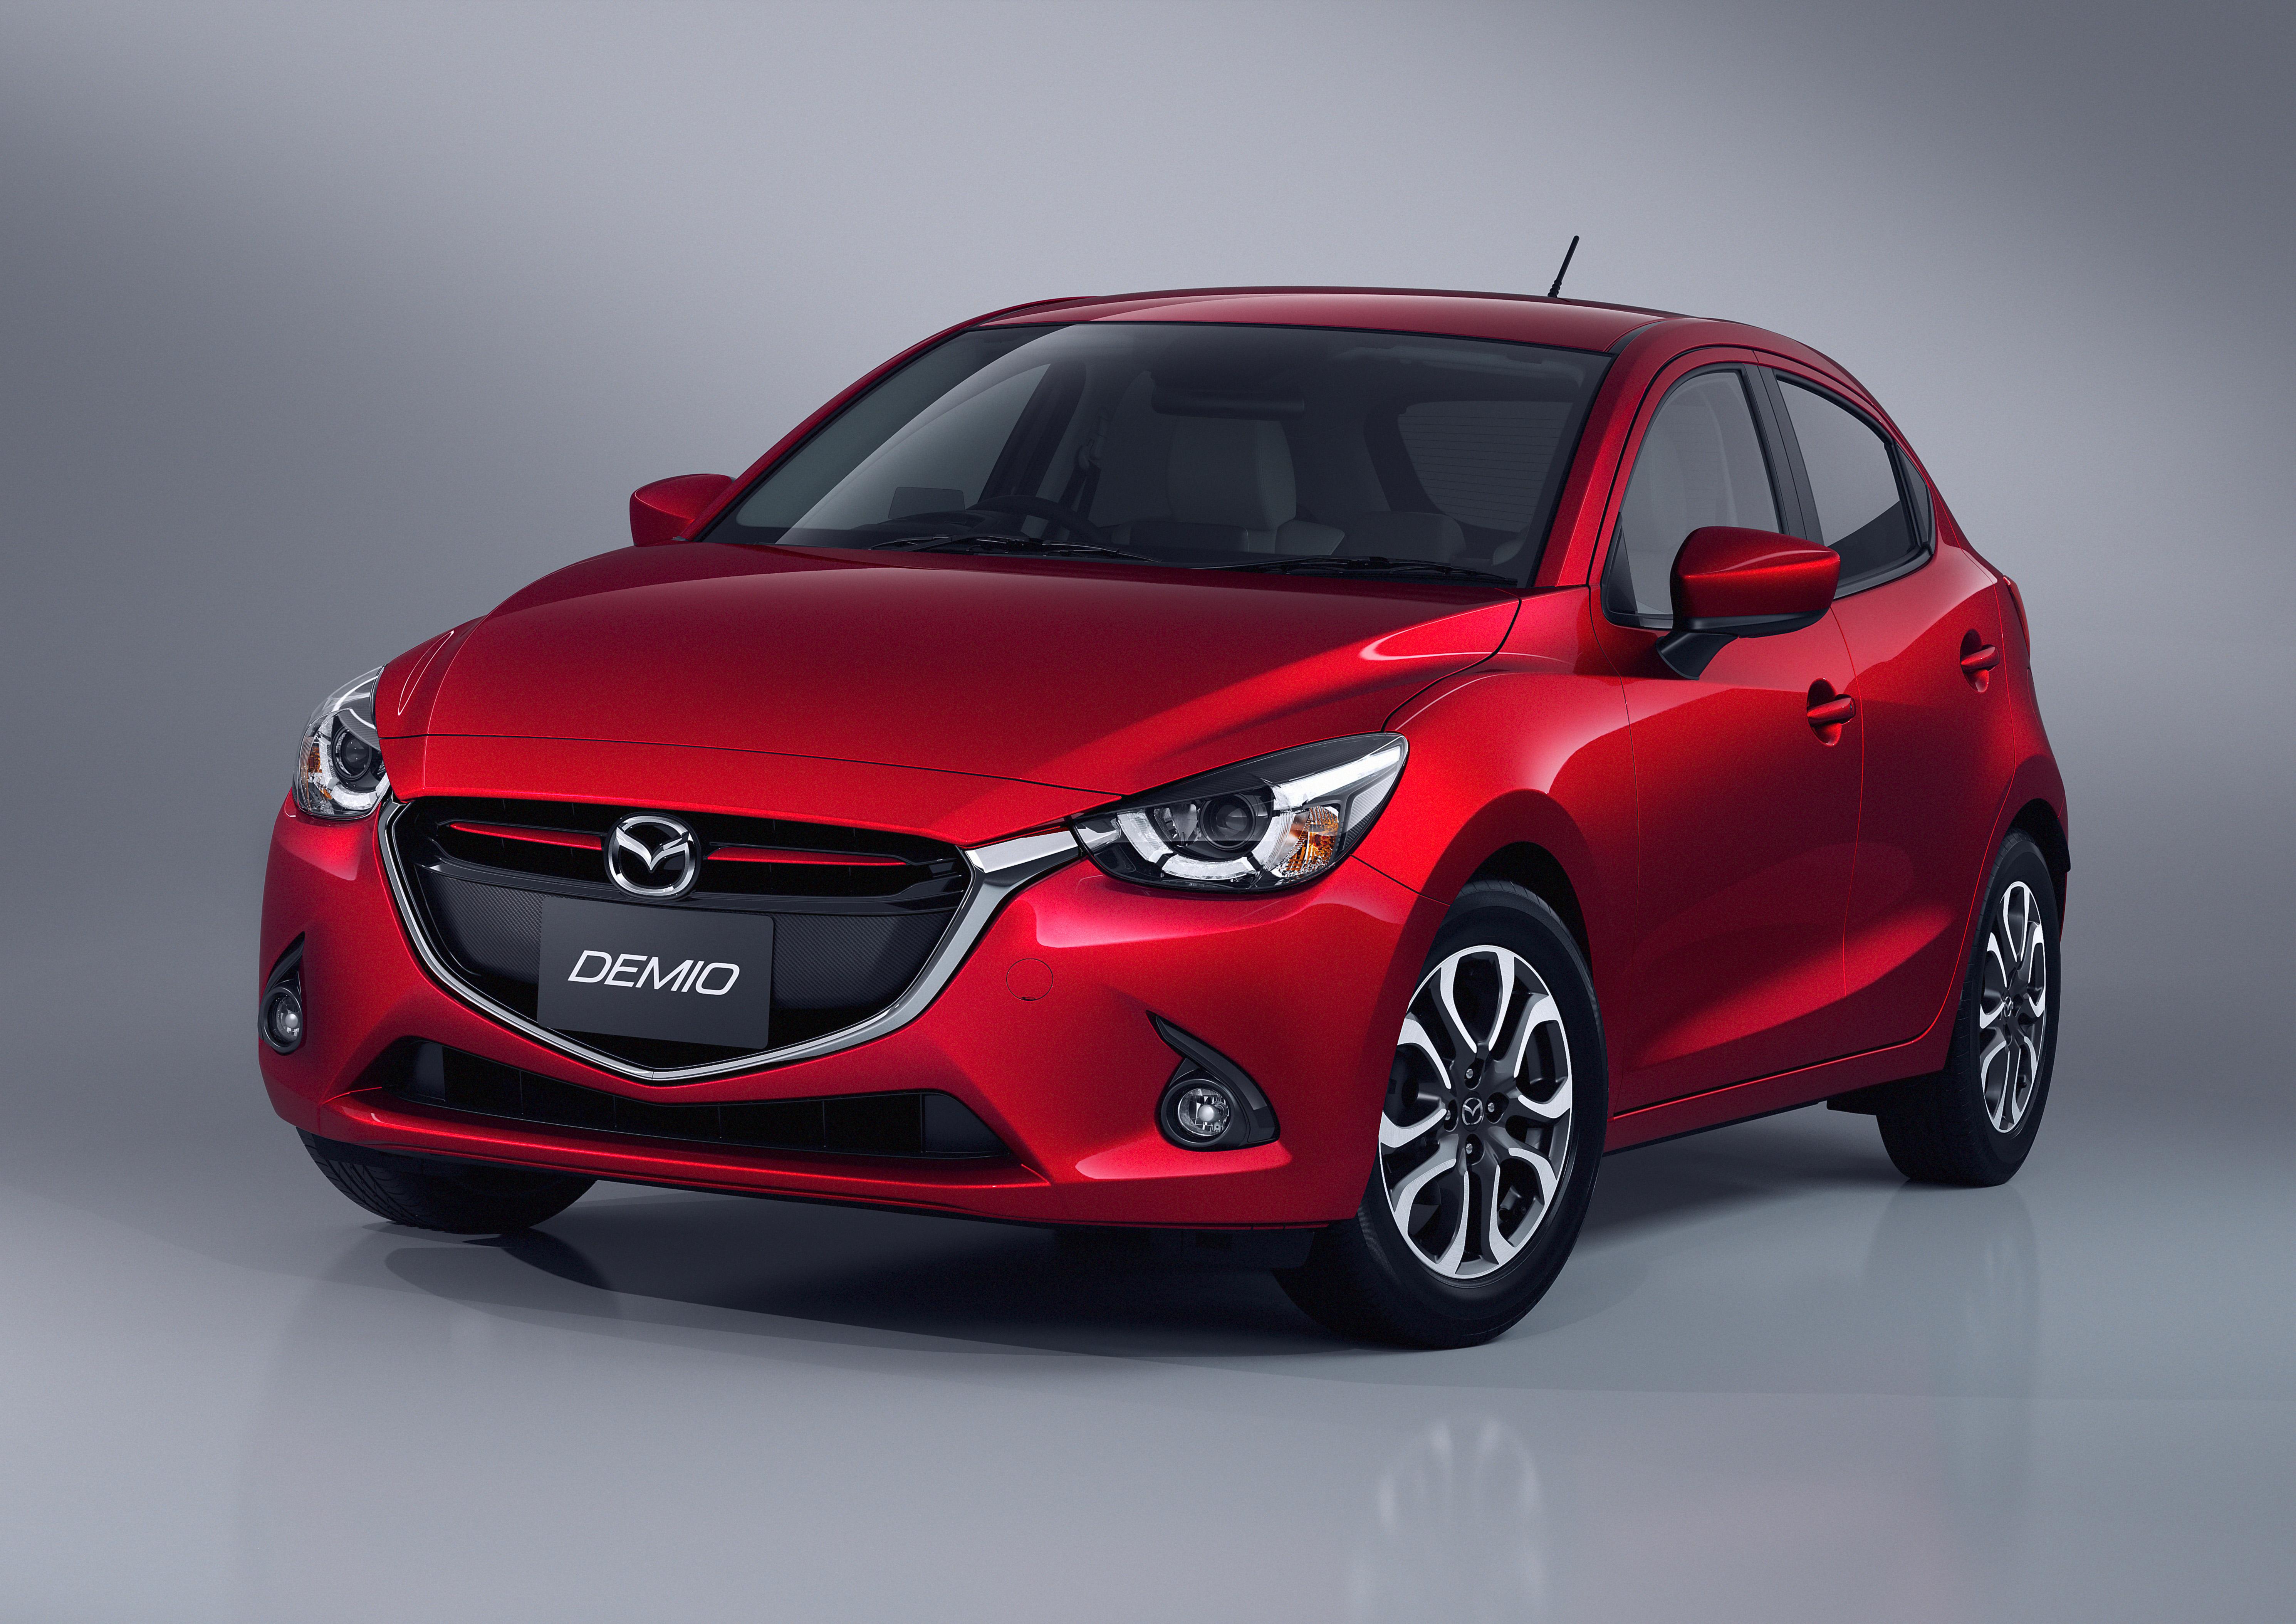 2016 Mazda2 Unveiled Globally